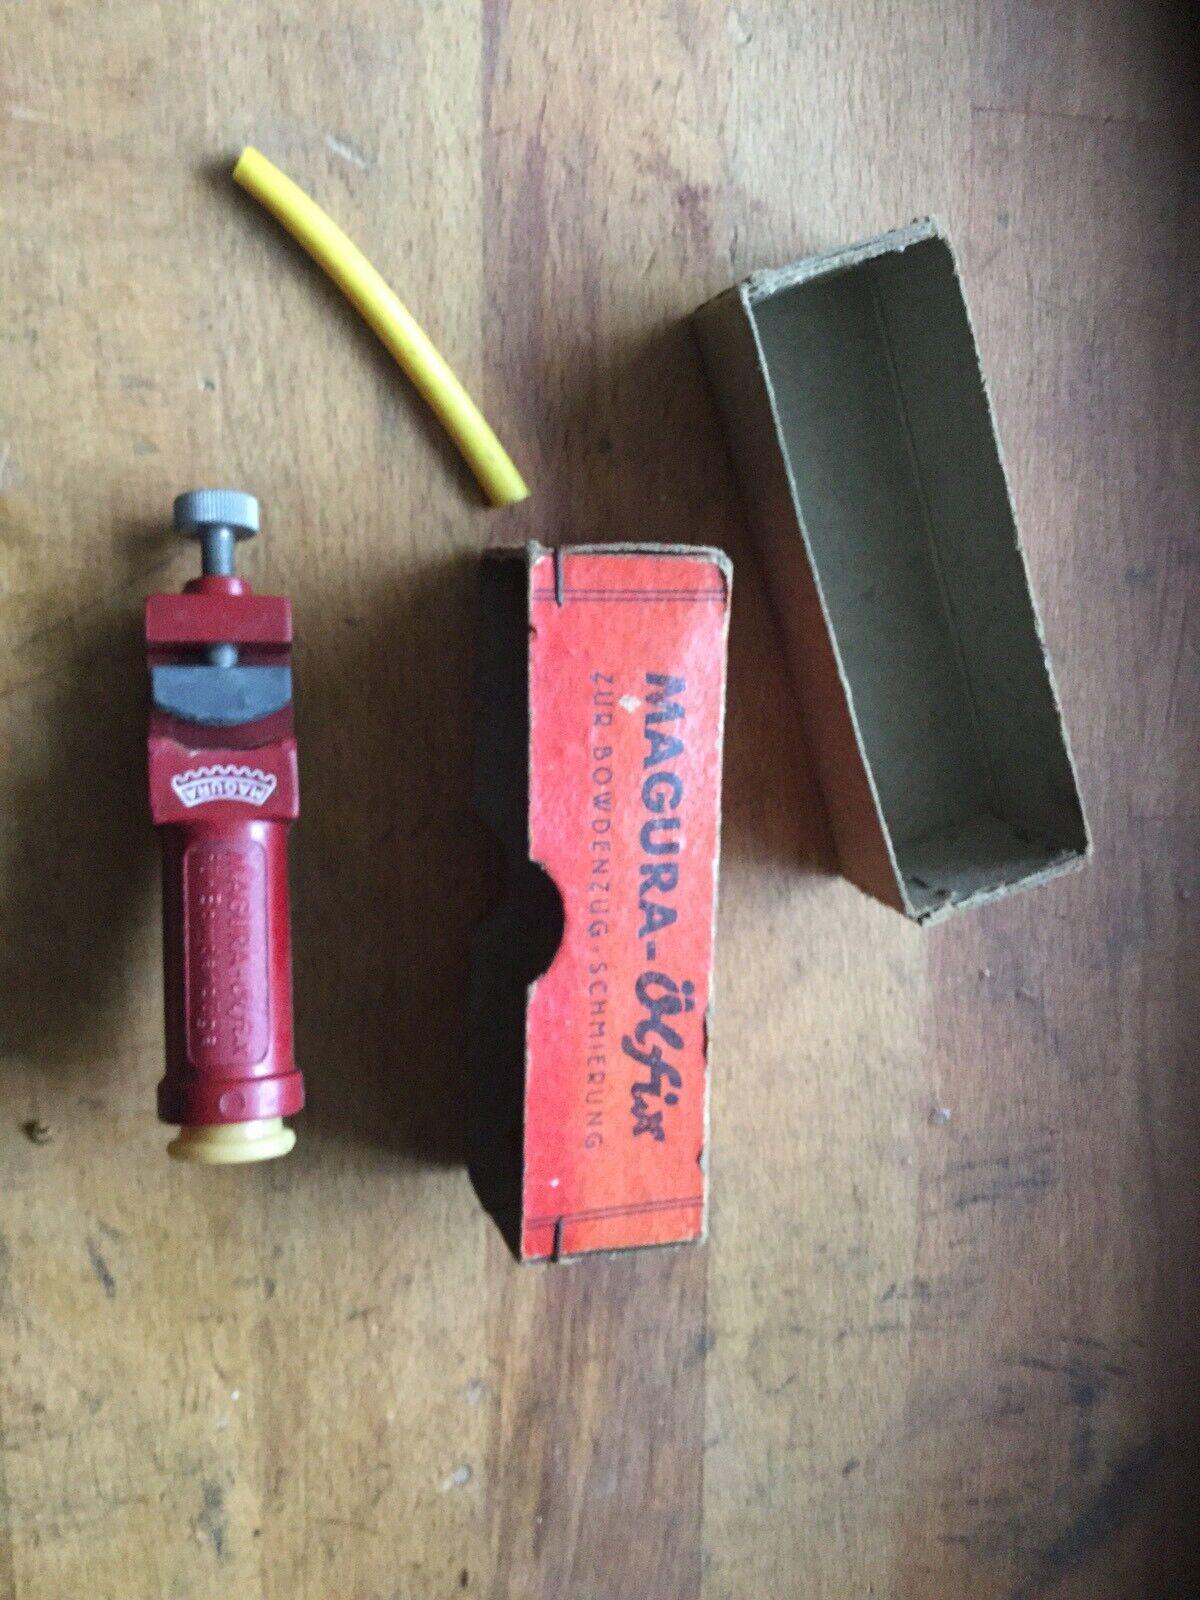 Freno de disco Magura aceite Fix Mini Kit de servicio  VINTAGE